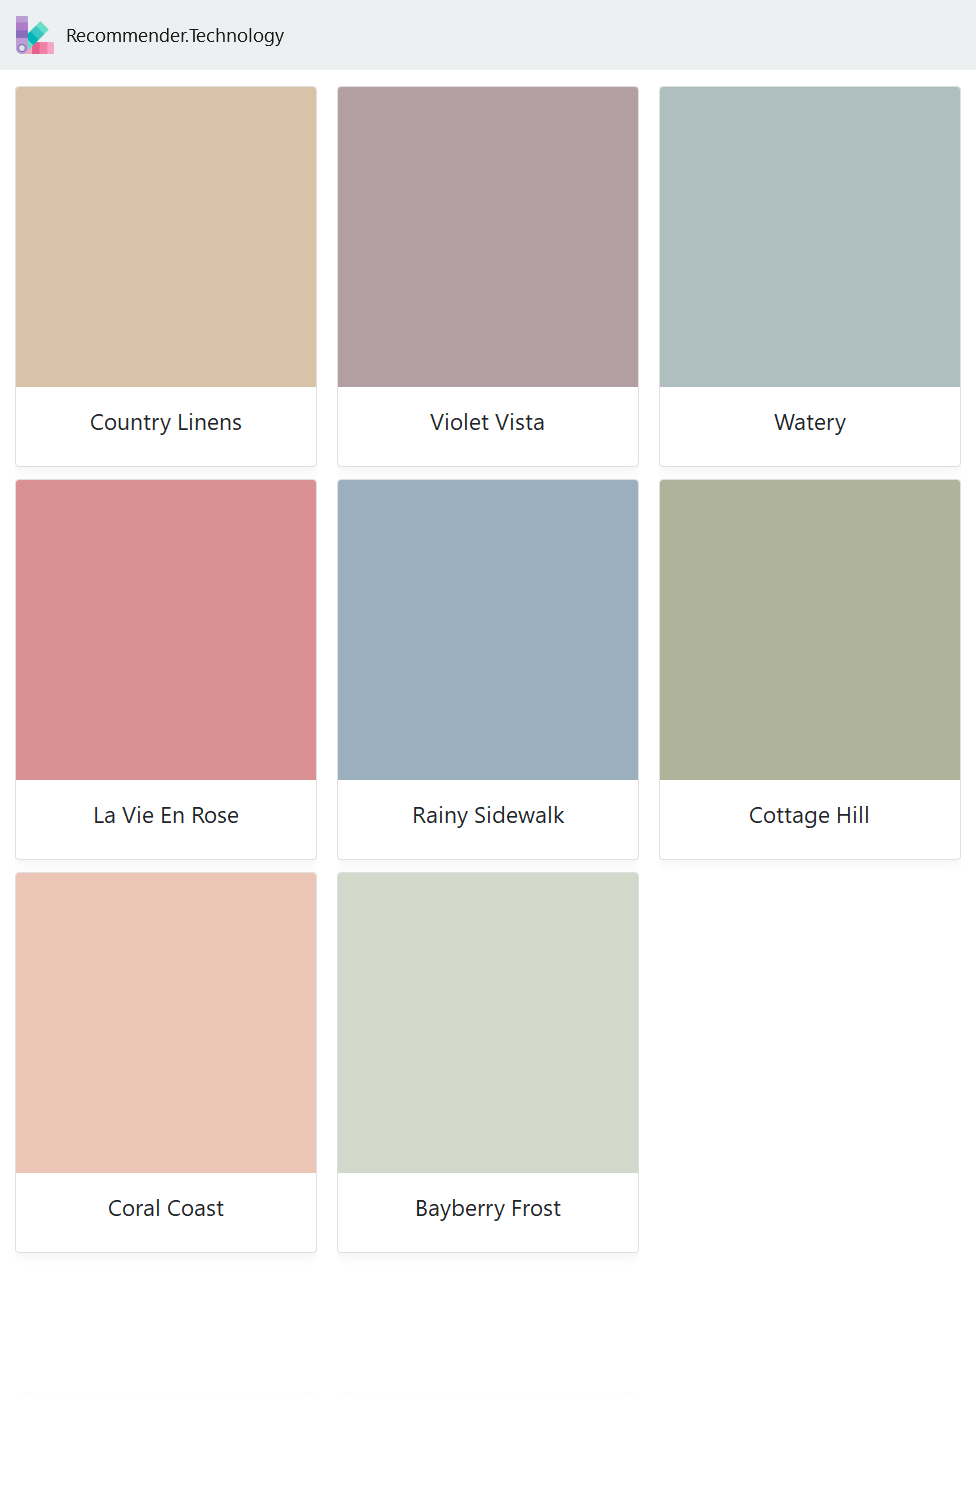 Country Linens La Vie En Rose Coral Coast Violet Vista Rainy Sidewalk Bayberry Frost Watery Cot Behr Marquee Paint Behr Paint Colors House Color Schemes